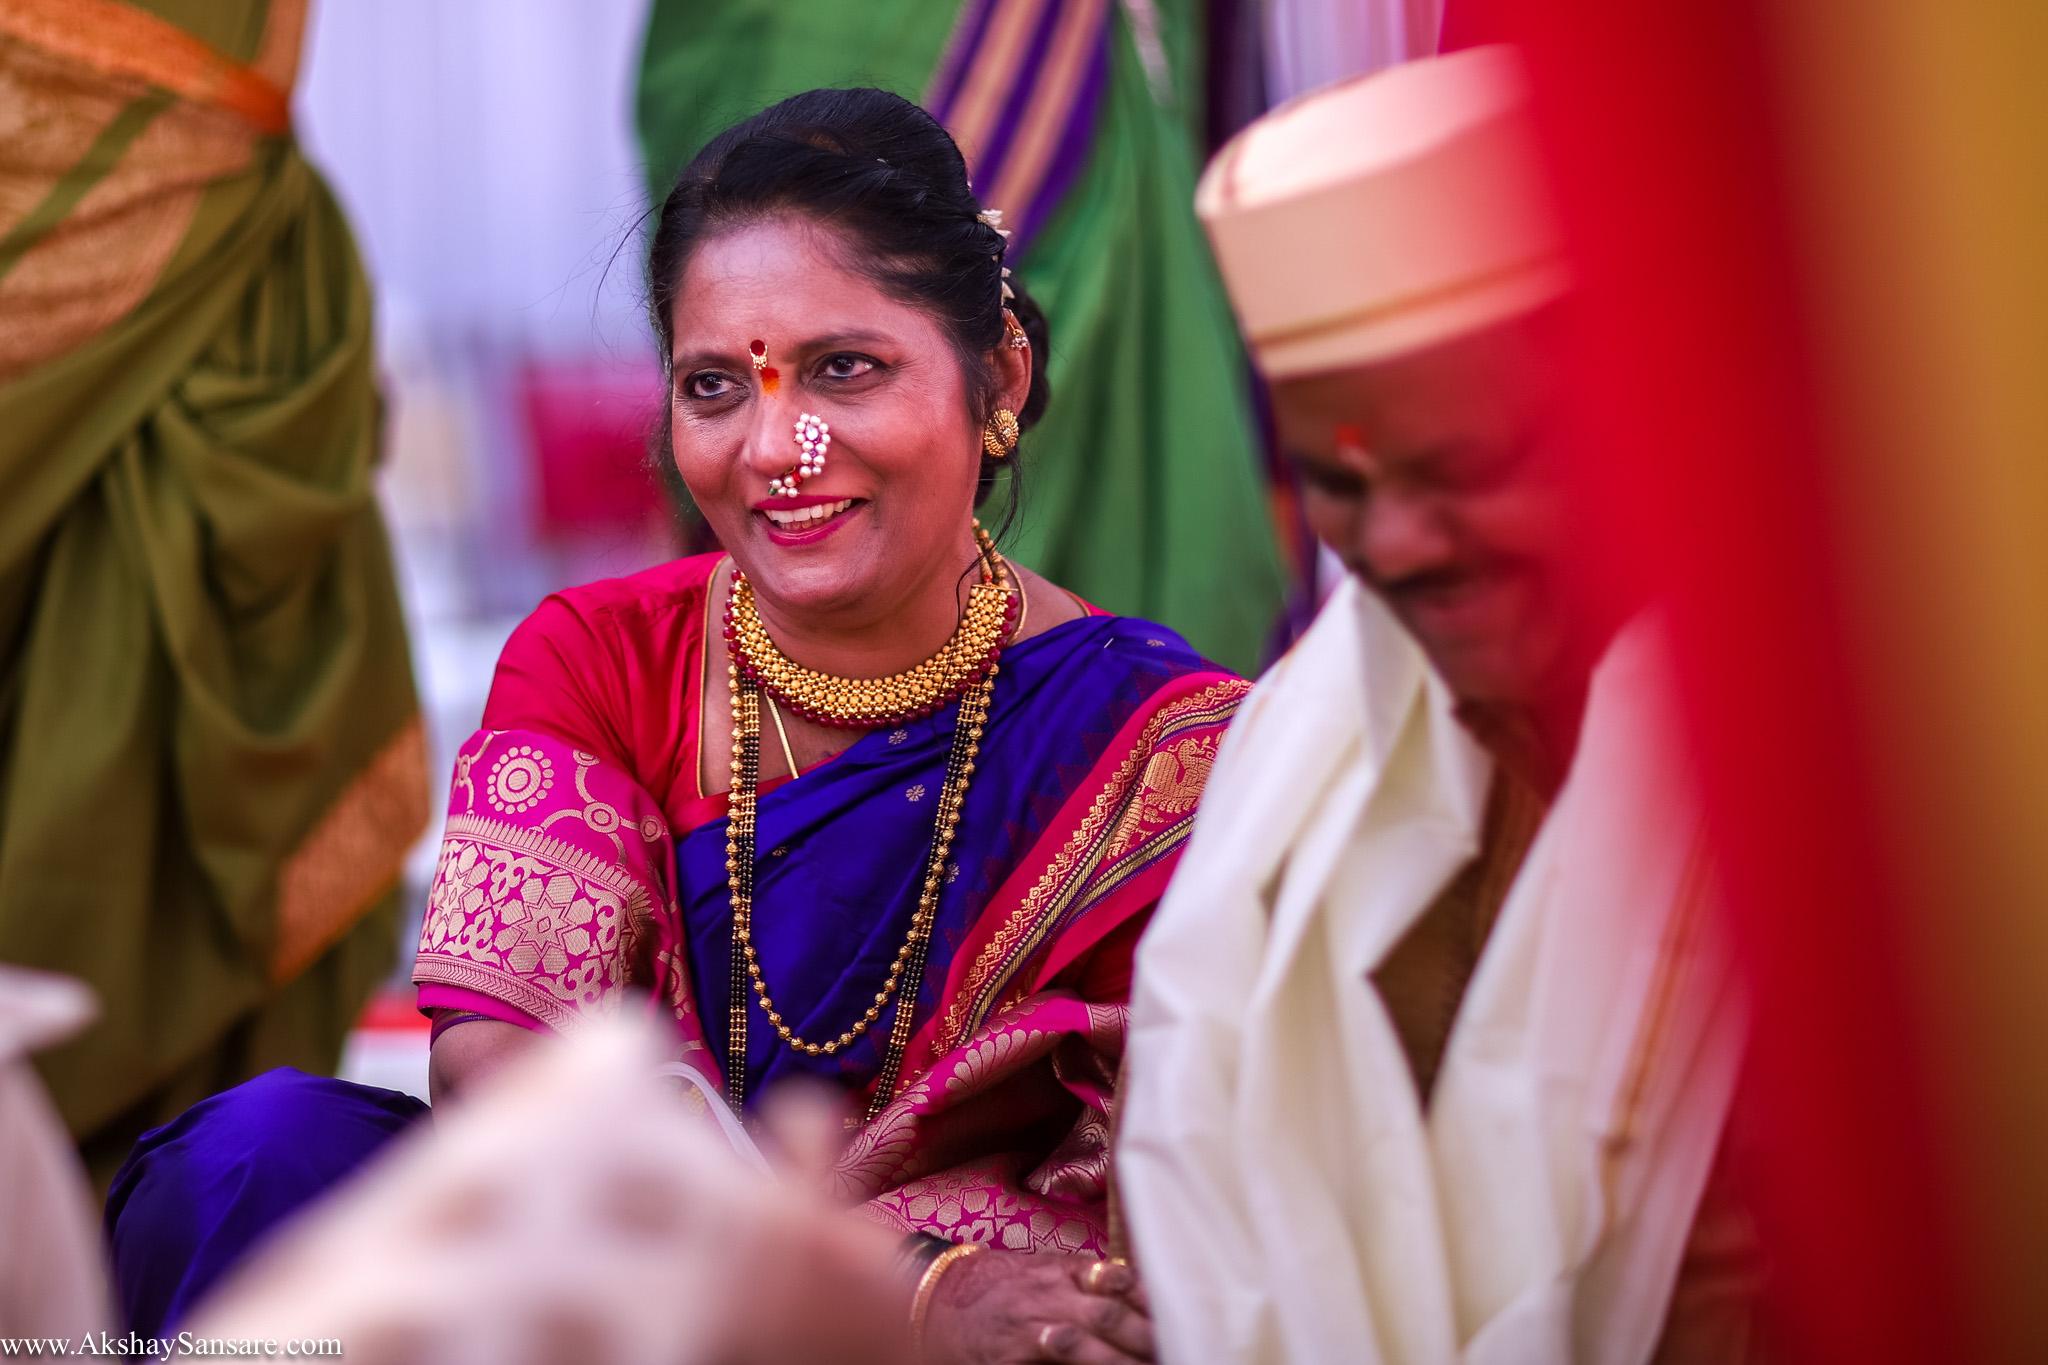 Salil x Kimaya Akshay Sansare Photography Candid wedding Photographer in mumbai best(16).jpg